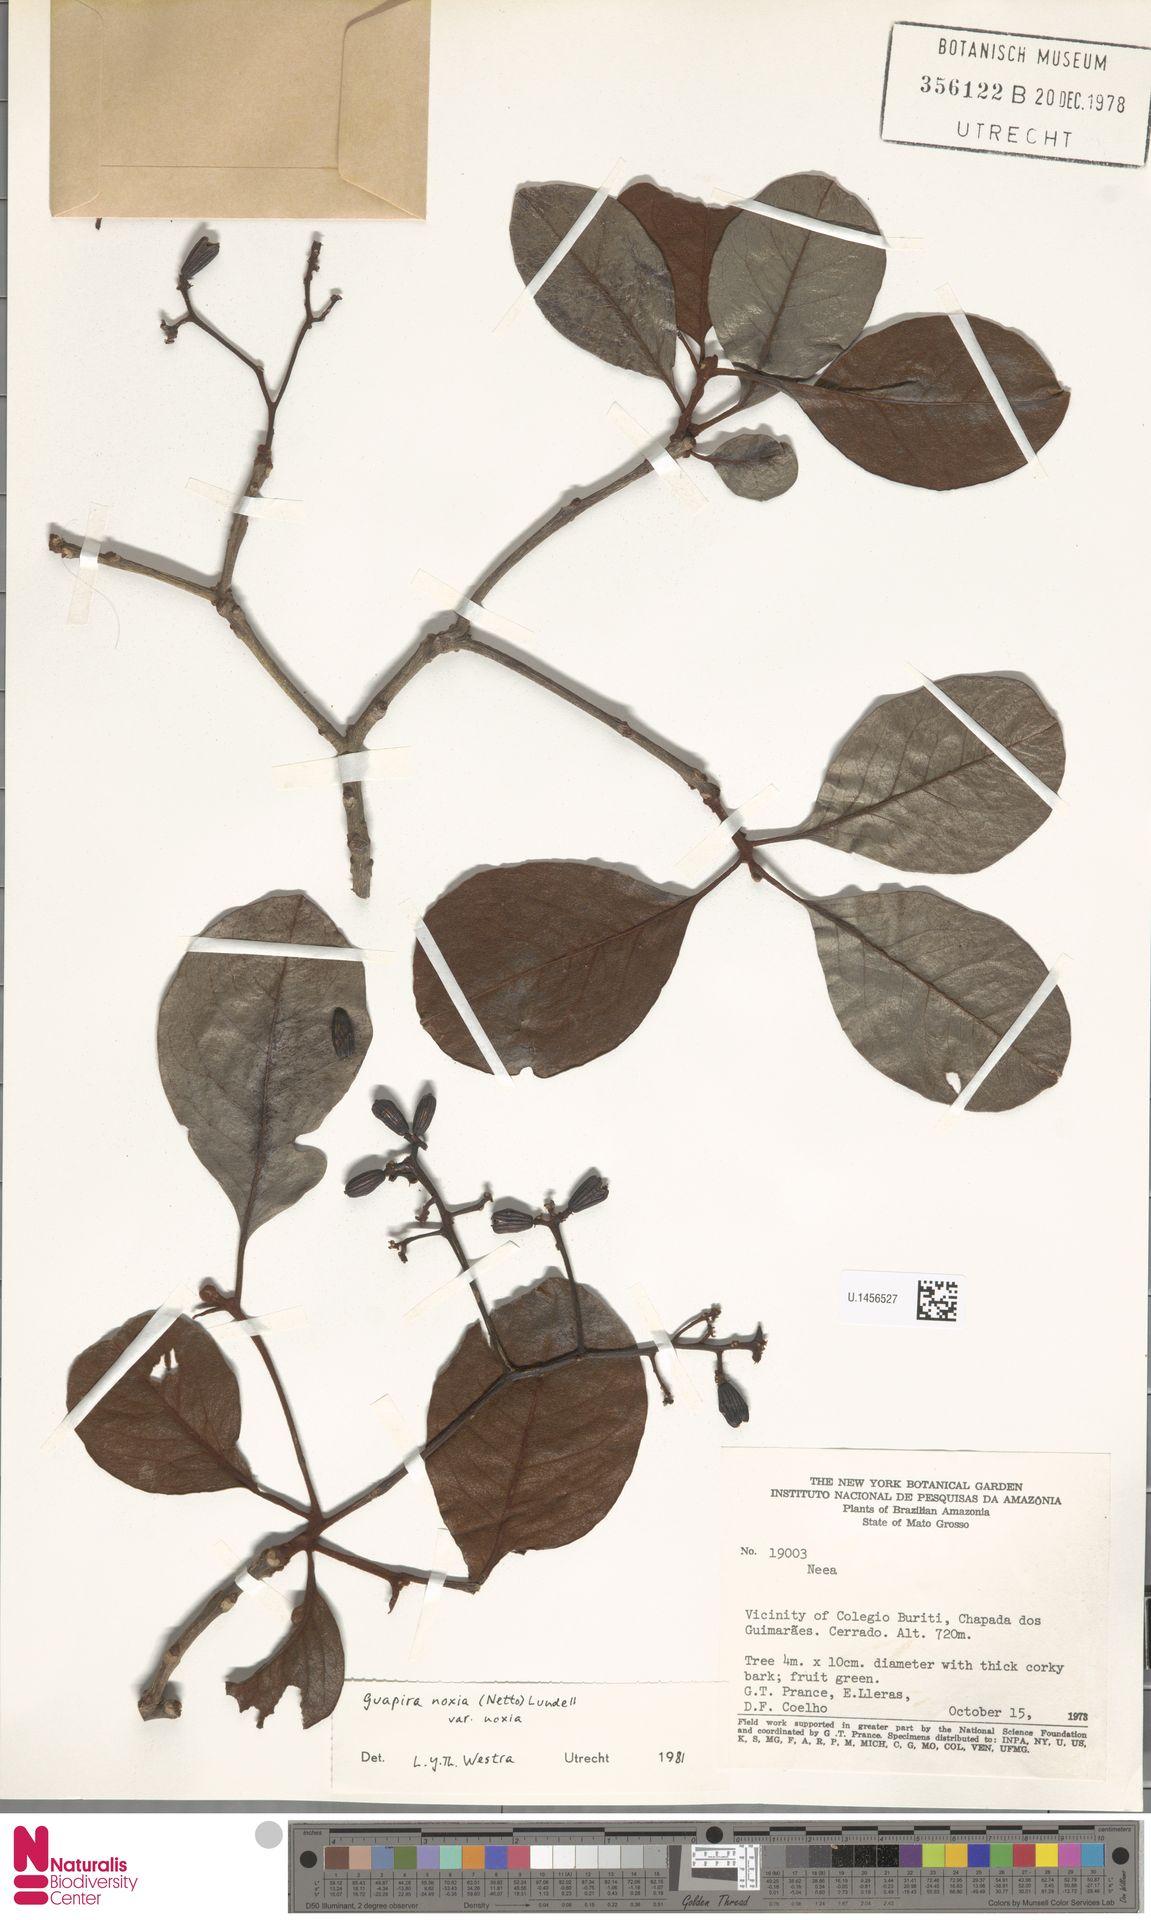 U.1456527 | Guapira noxia (Netto) Lundell